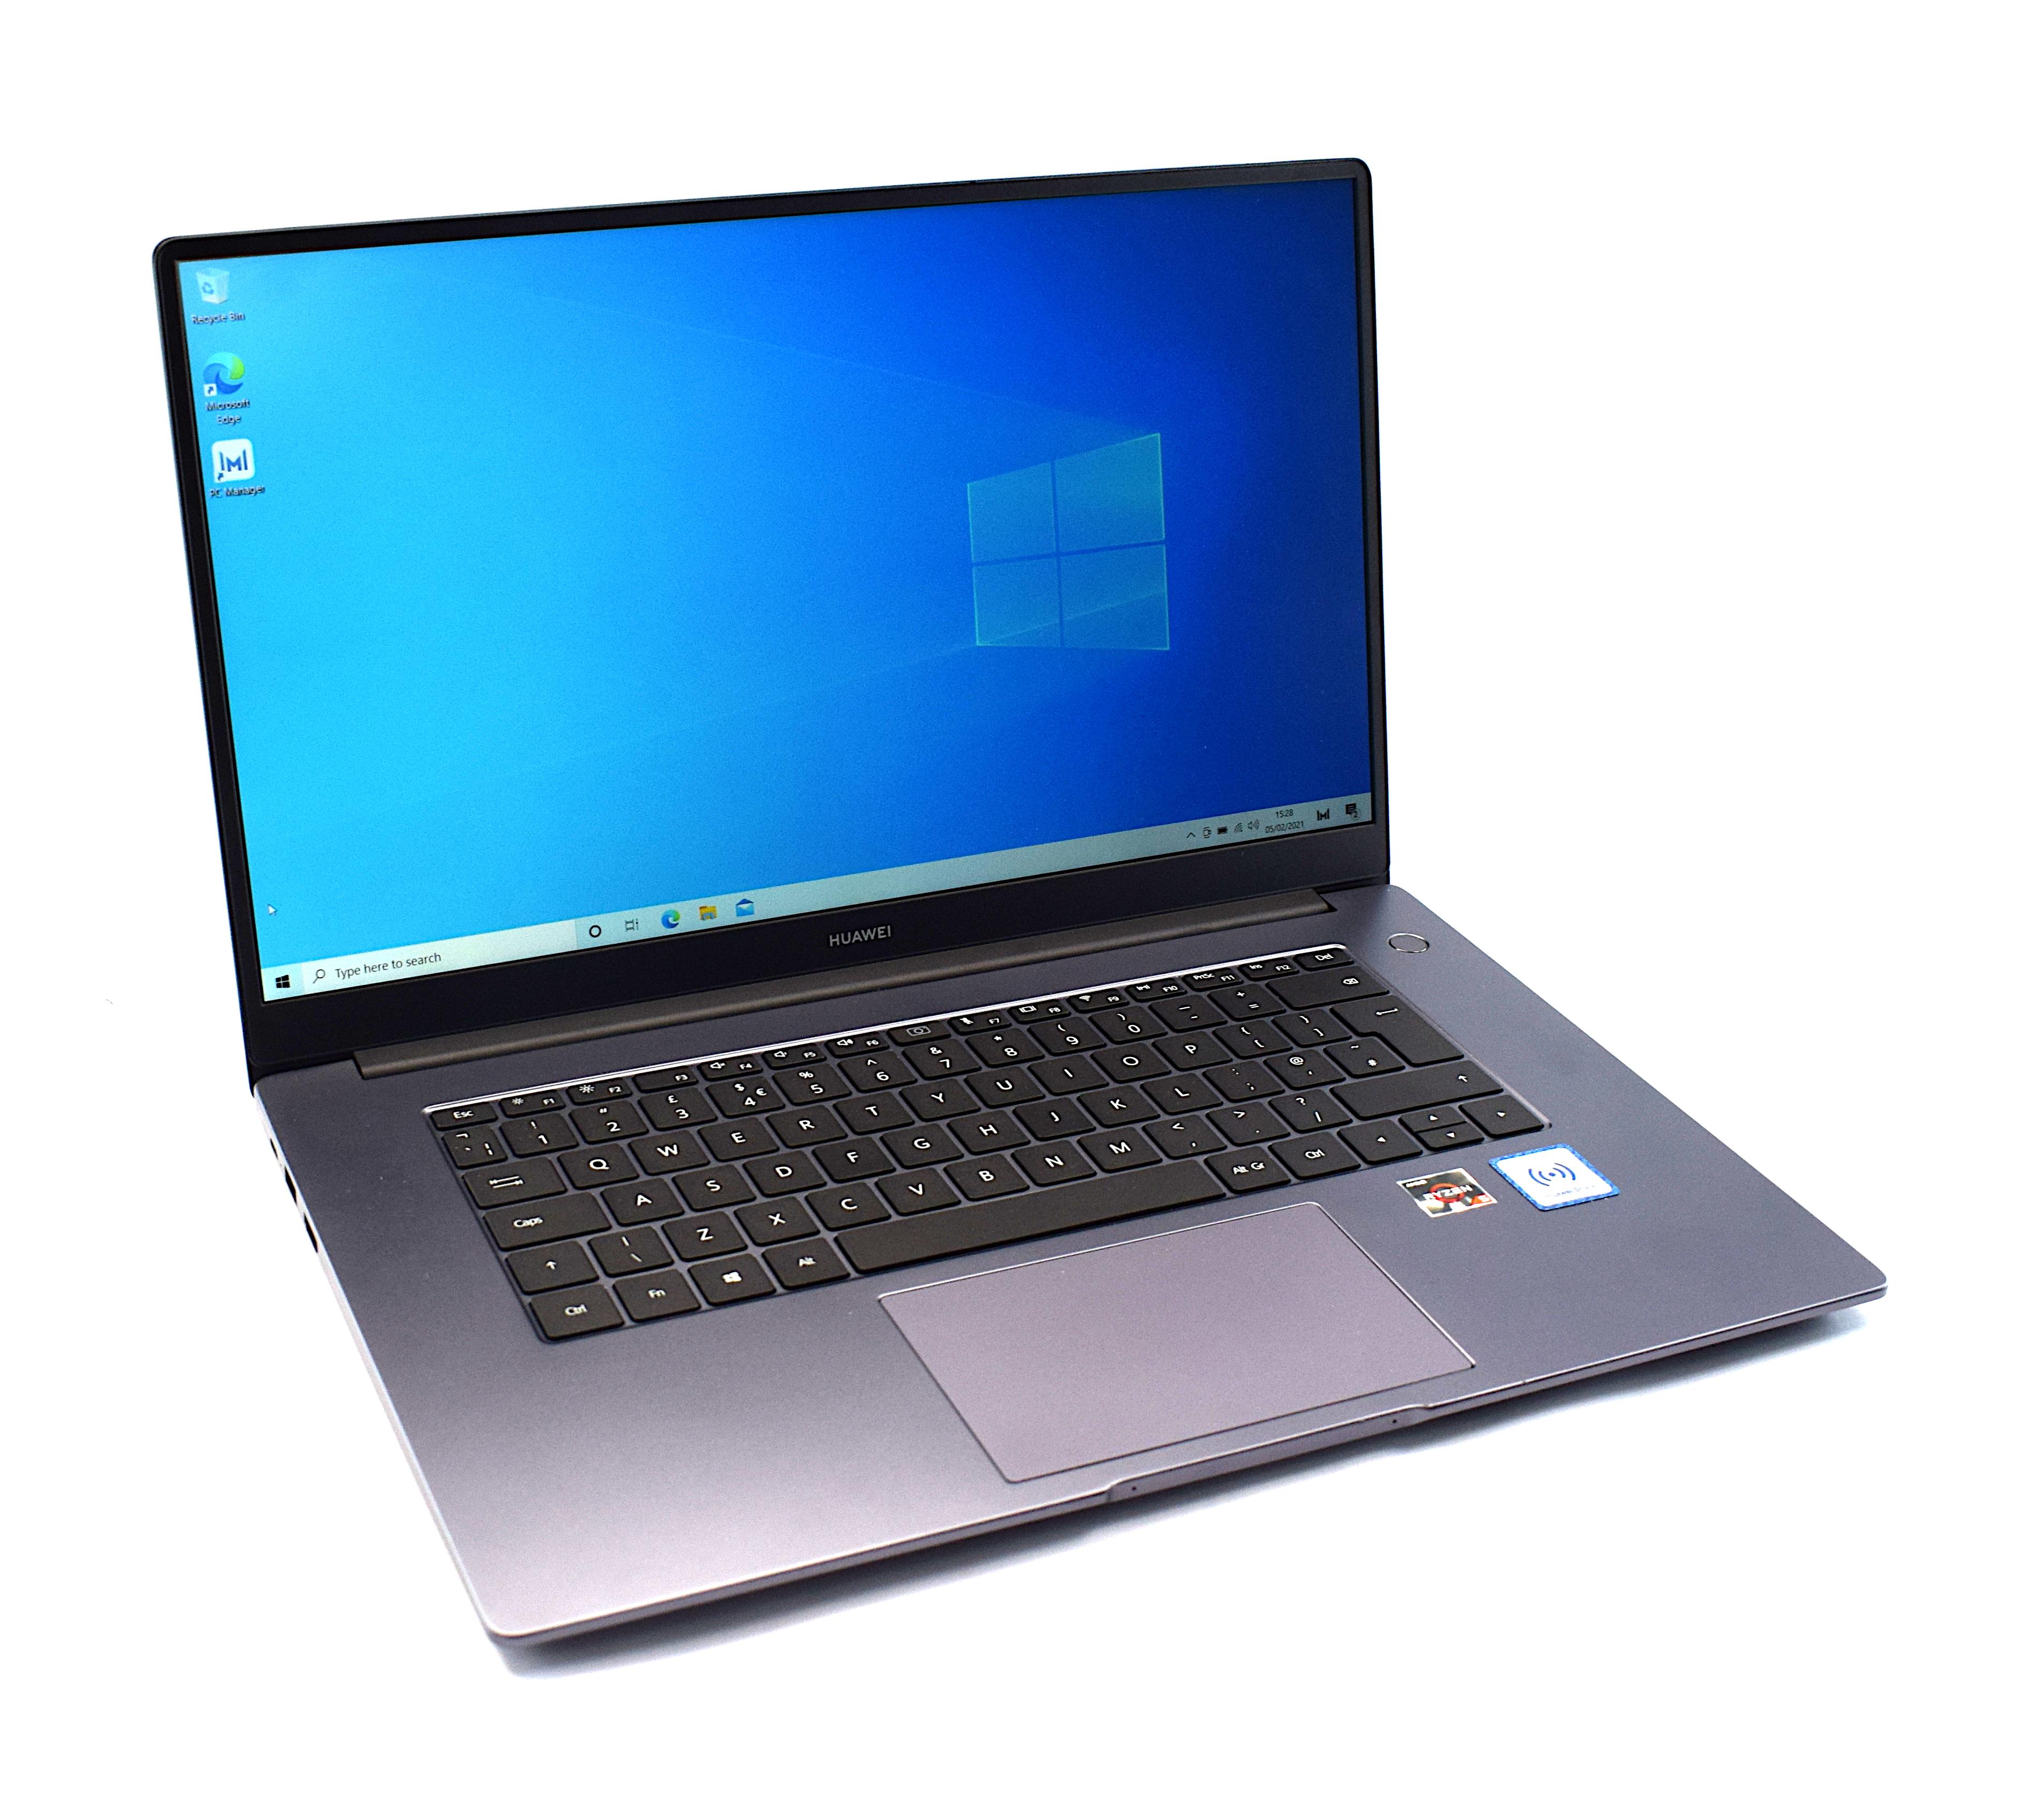 "Huawei MateBook D 15 AMD Ryzen 5 8GB RAM 256GB SSD 15.6"" Display Windows 10 Home"